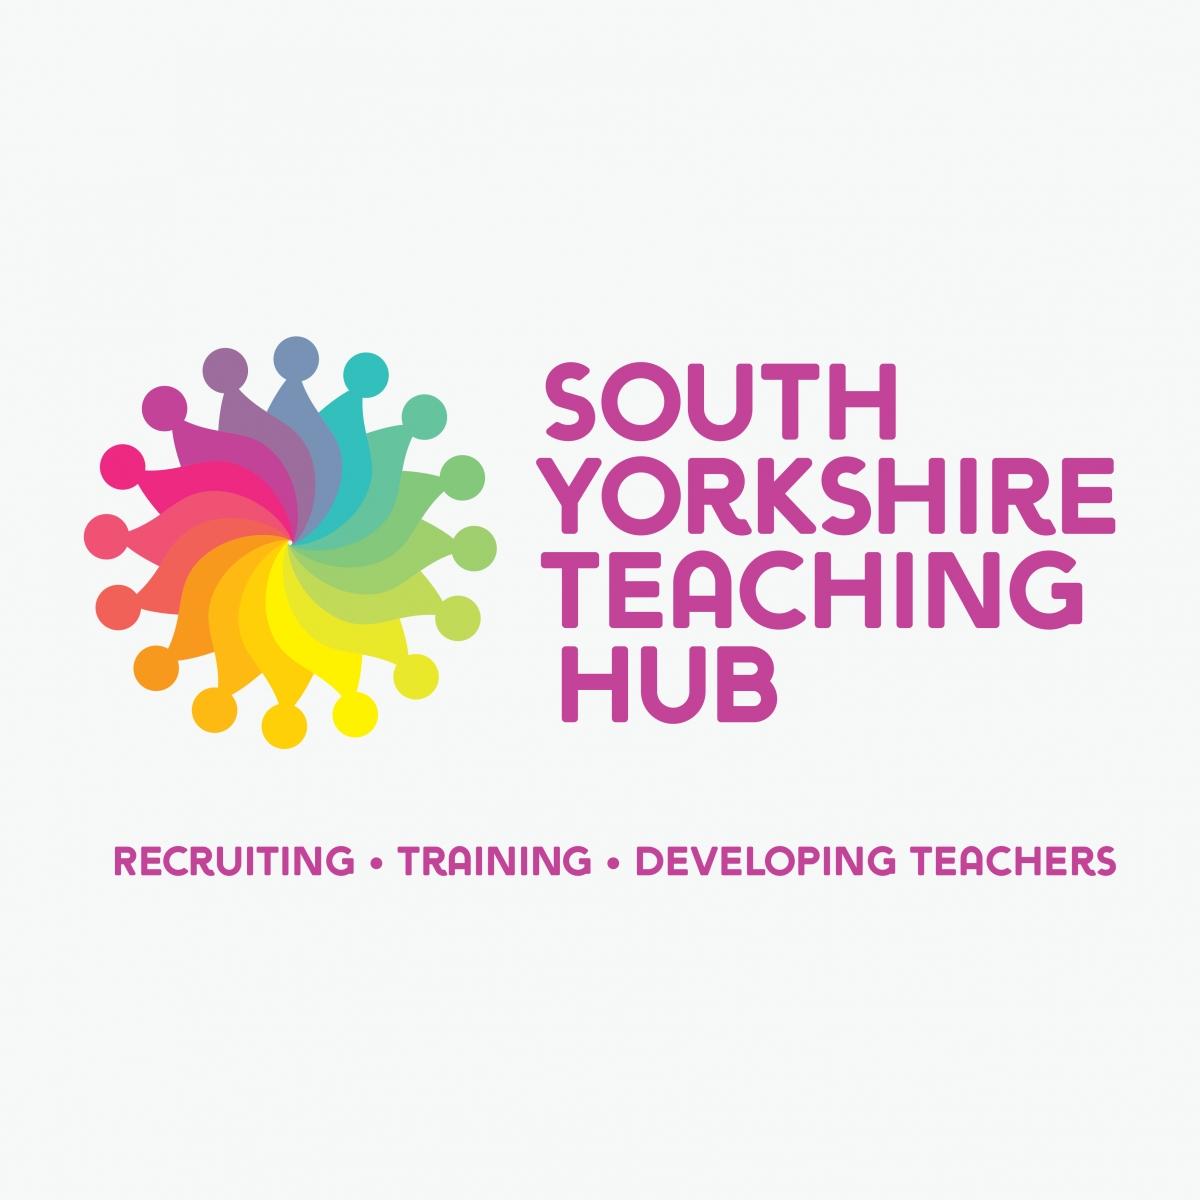 South Yorkshire Teaching Hub